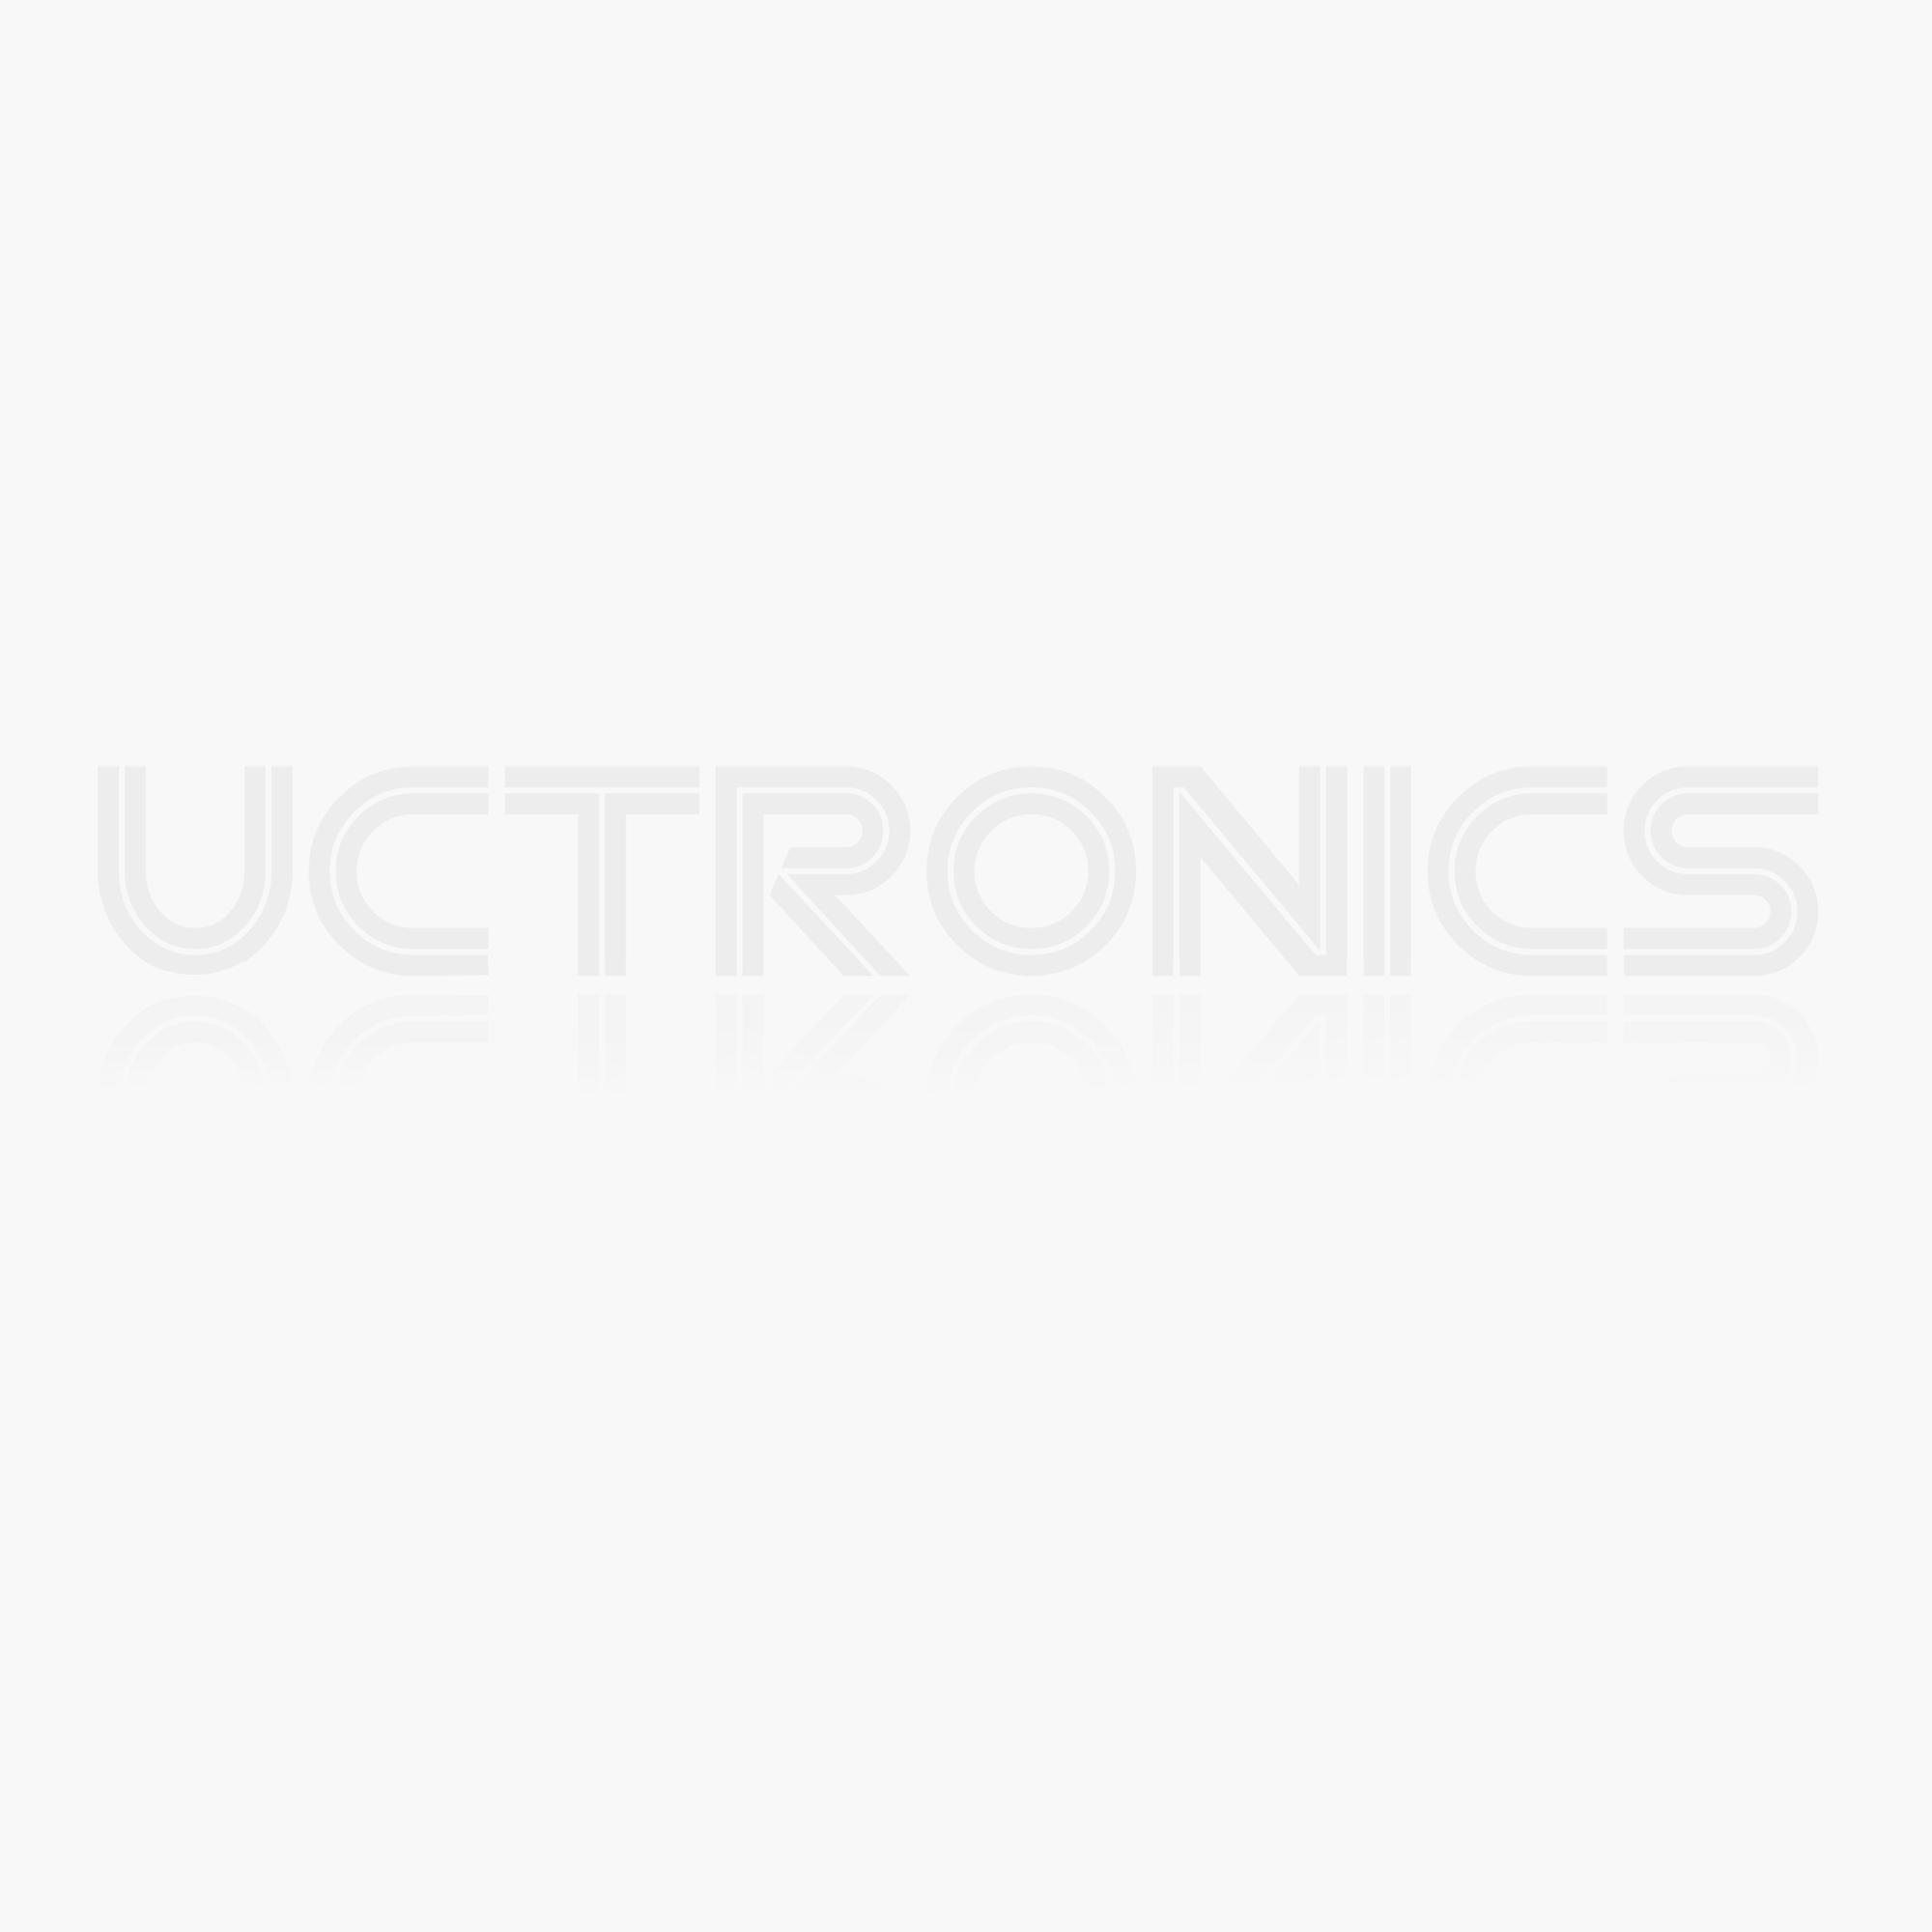 5 Keys Remote Control Infrared 8m Transmit UPD6122 NEC Controller Chip Encode